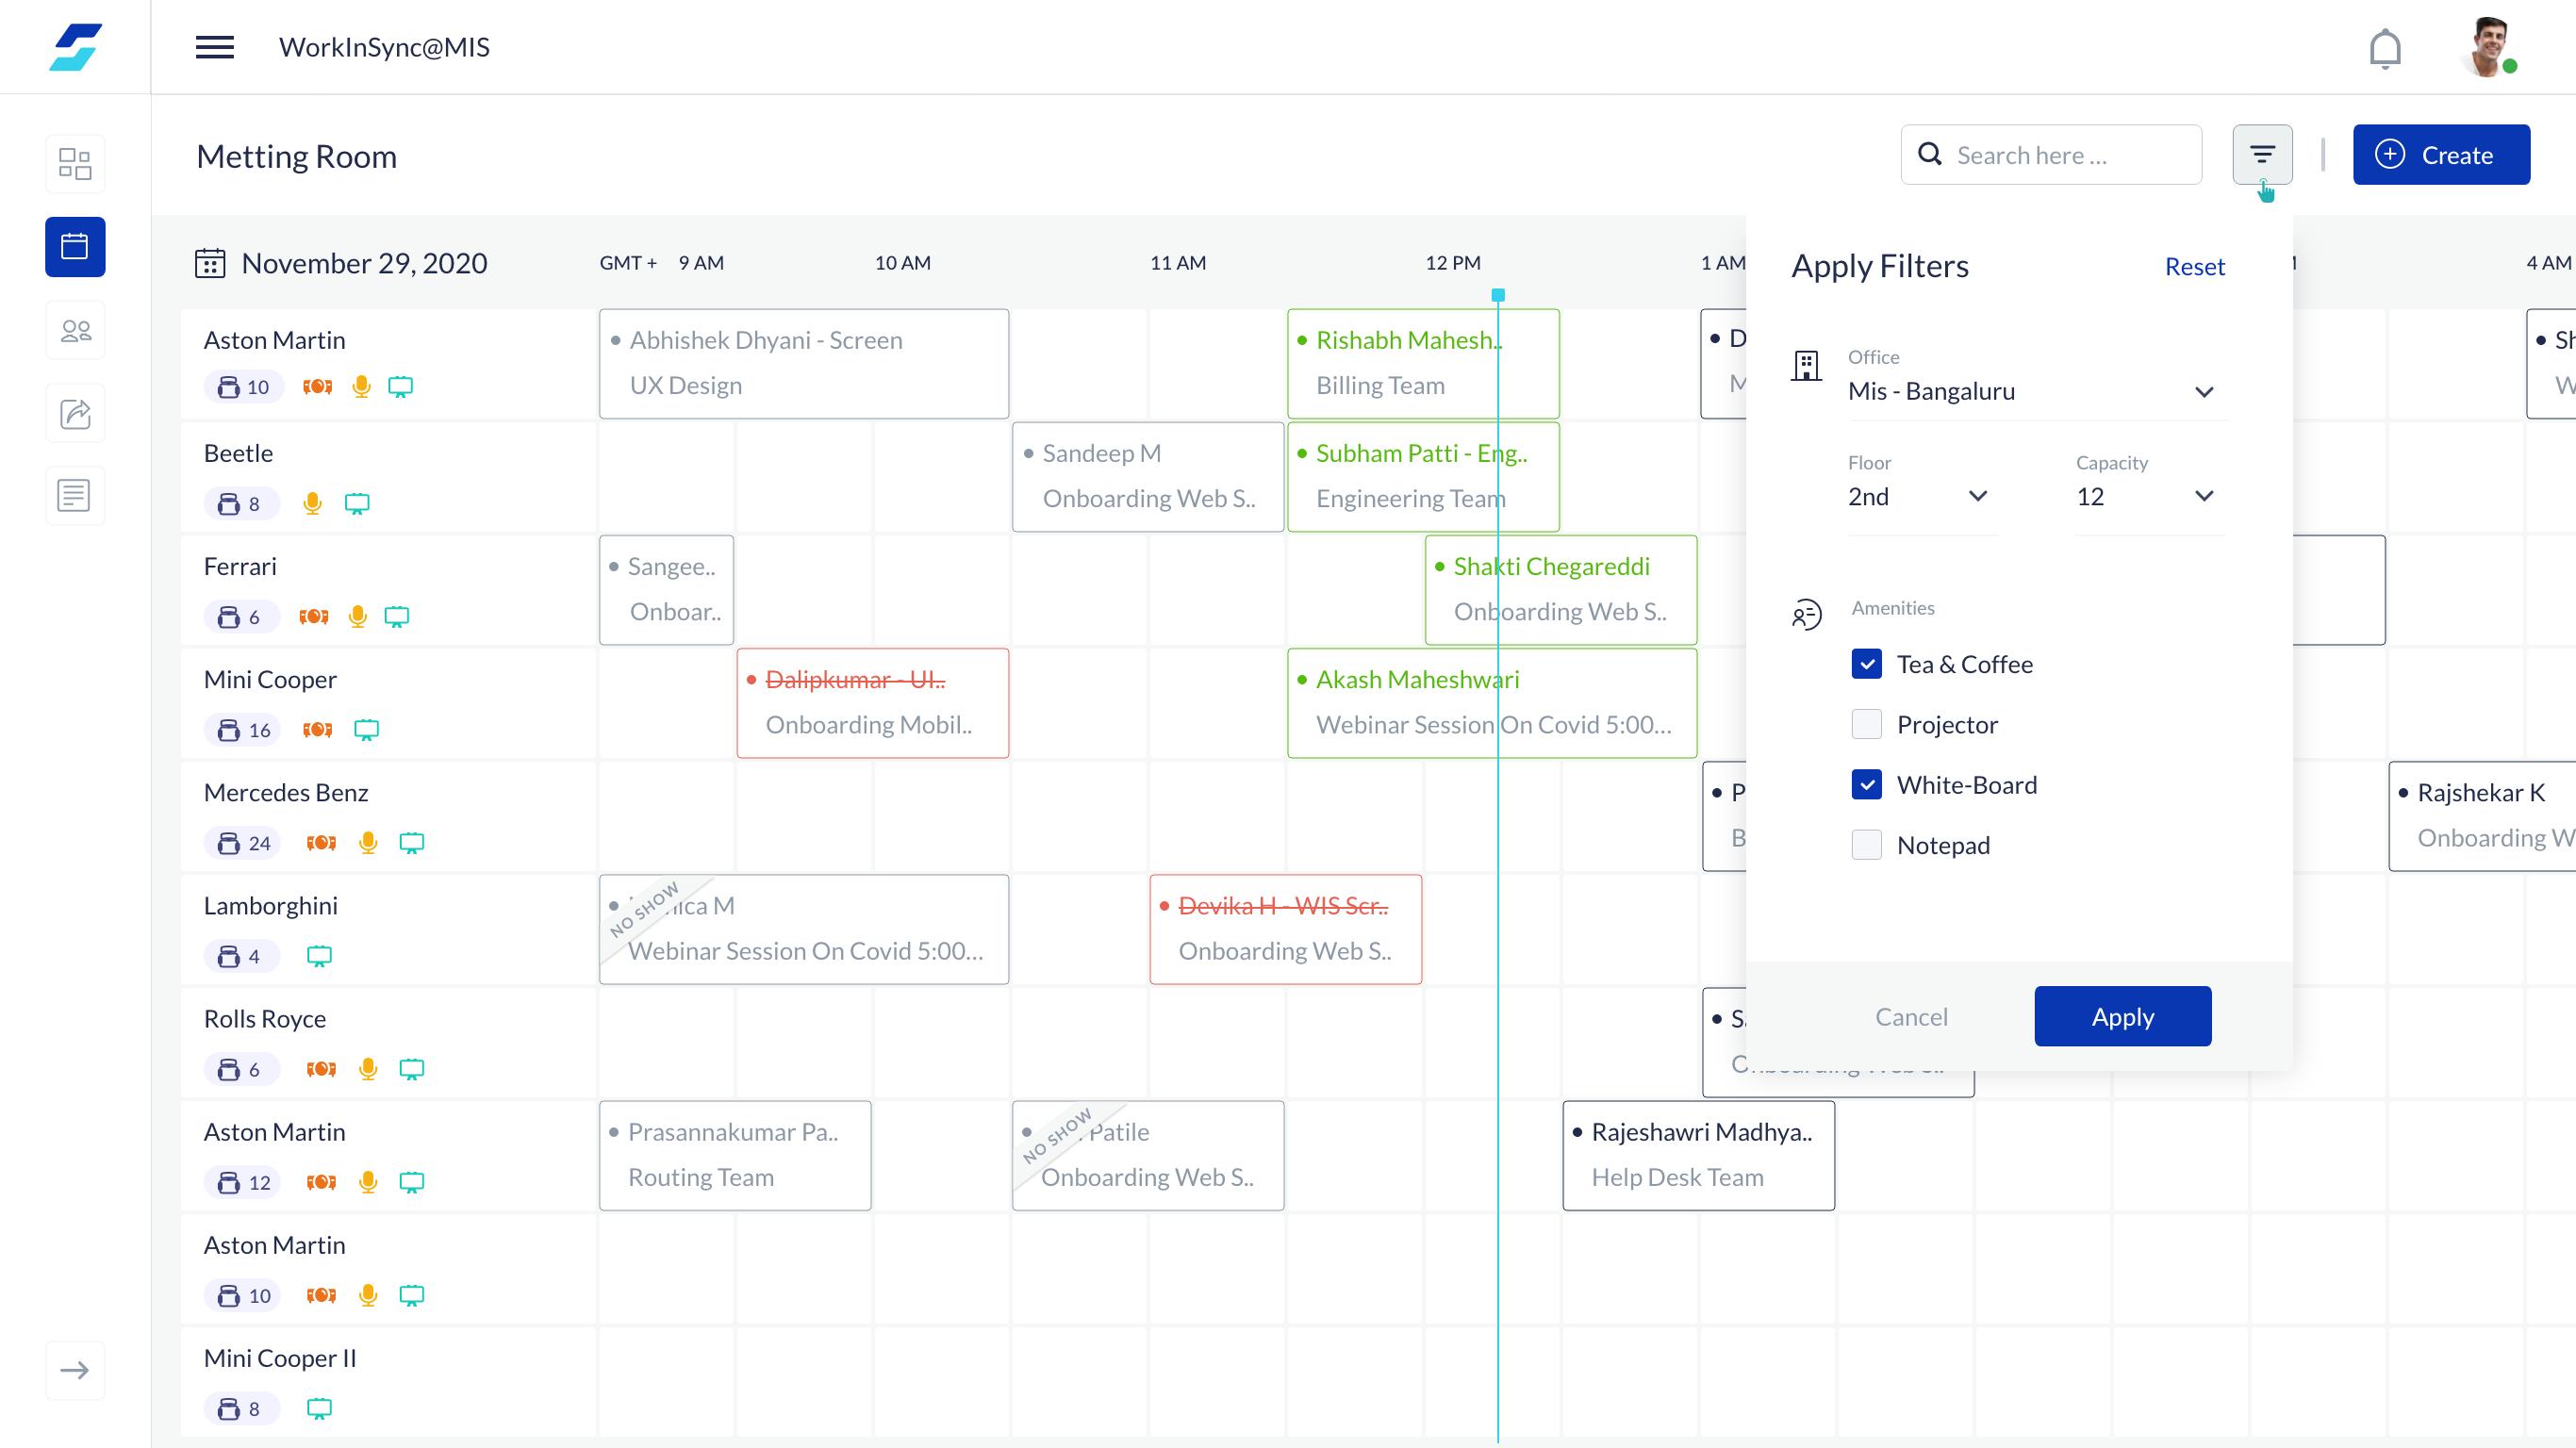 WorkInSync Software - Meeting Room Booking - Admin Dashboard